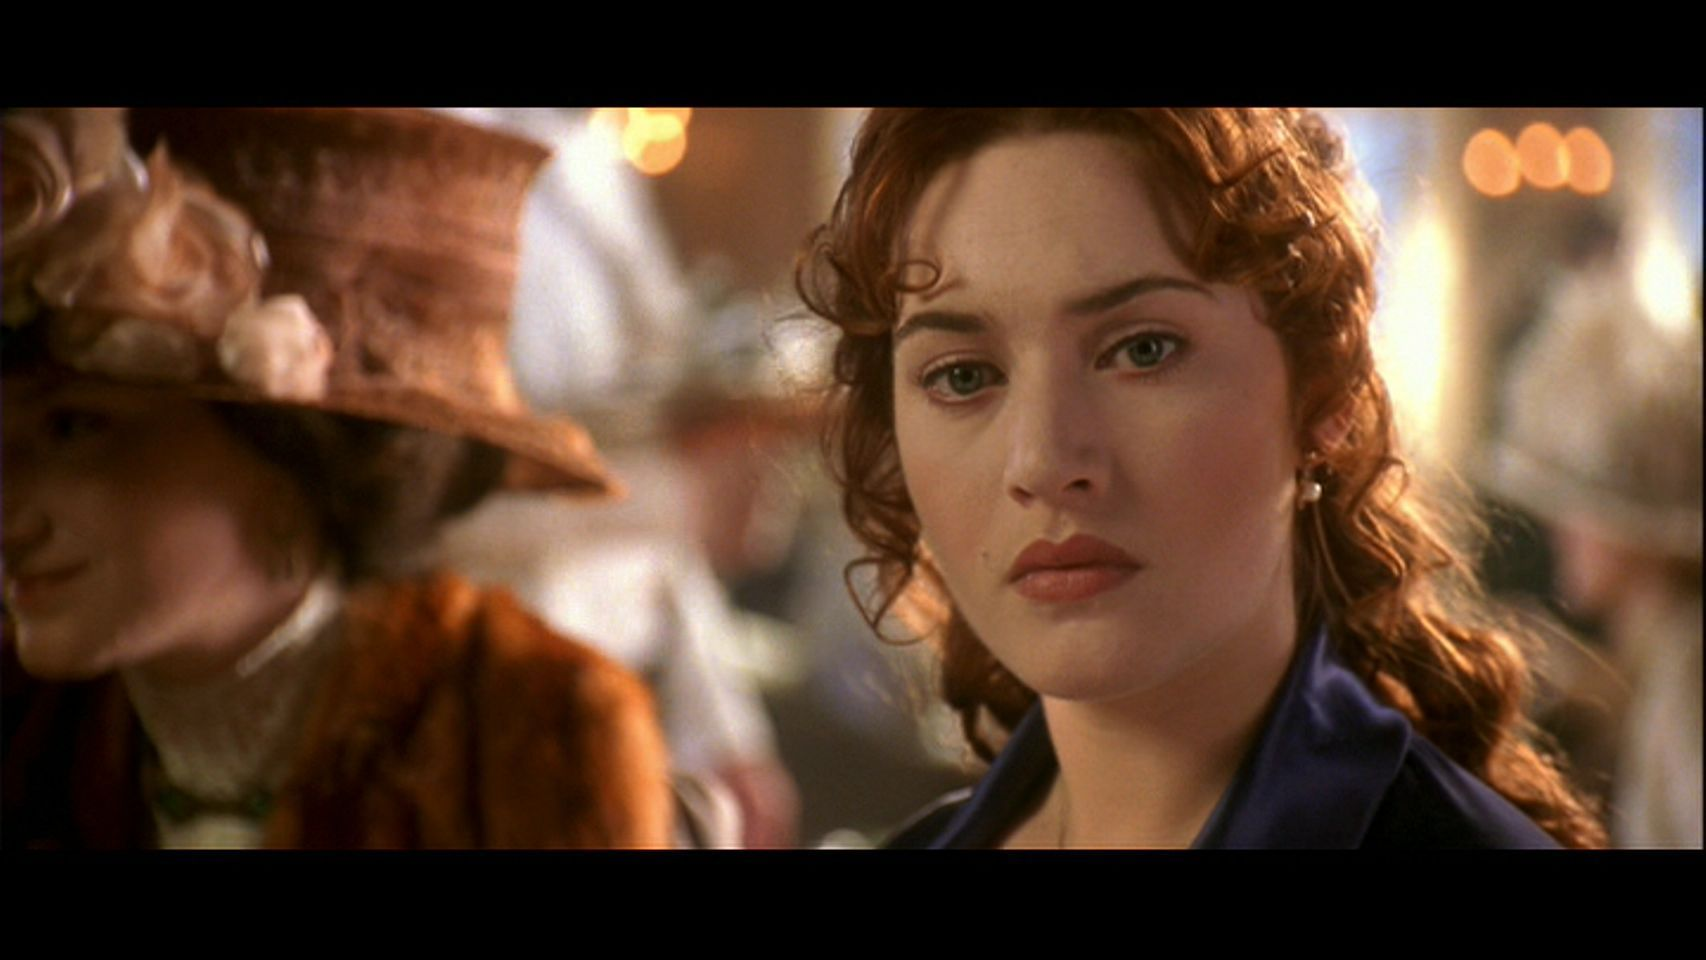 Titanic - Jack & Rose - Jack and Rose Image (22327939) - Fanpop